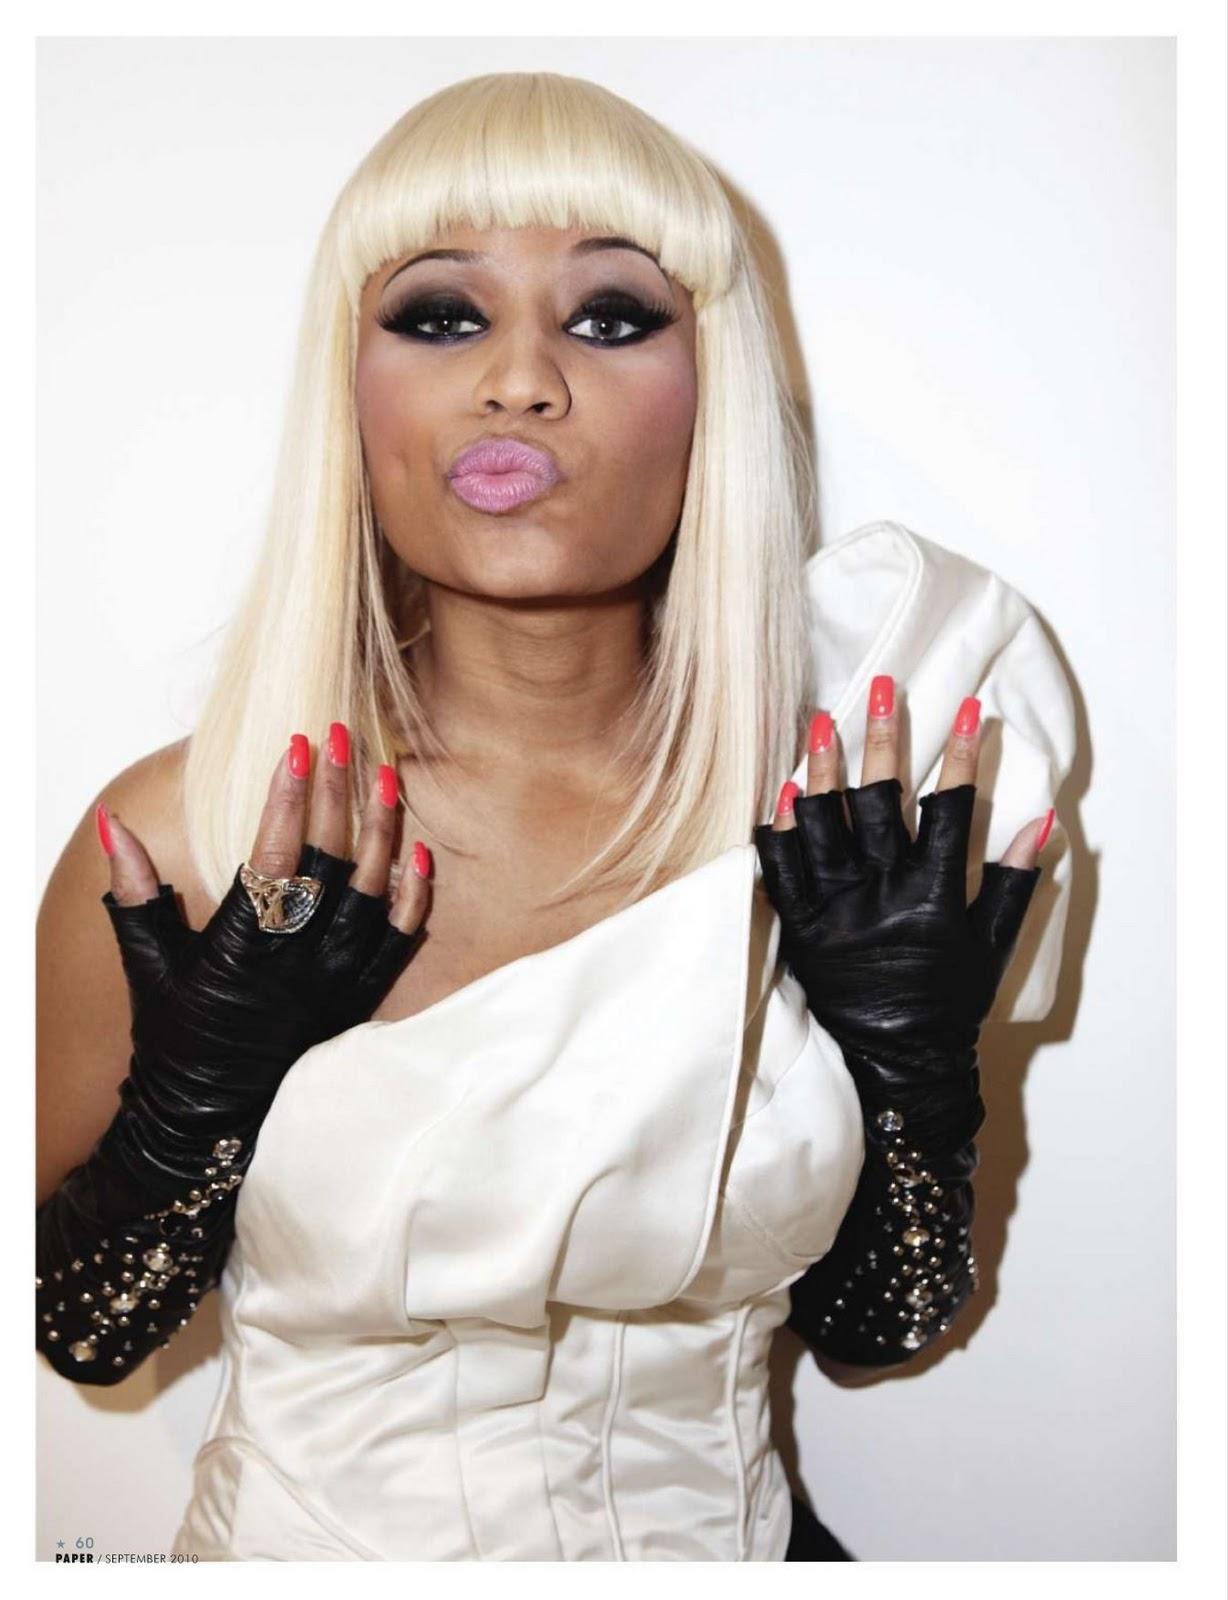 http://4.bp.blogspot.com/-ei5-RtaFz_c/TvwPOVTdygI/AAAAAAAABZc/CrX2h7wfwkA/s1600/Nicki-Minaj-superbass-lyrics-album-hairstyles+%252810%2529.jpg